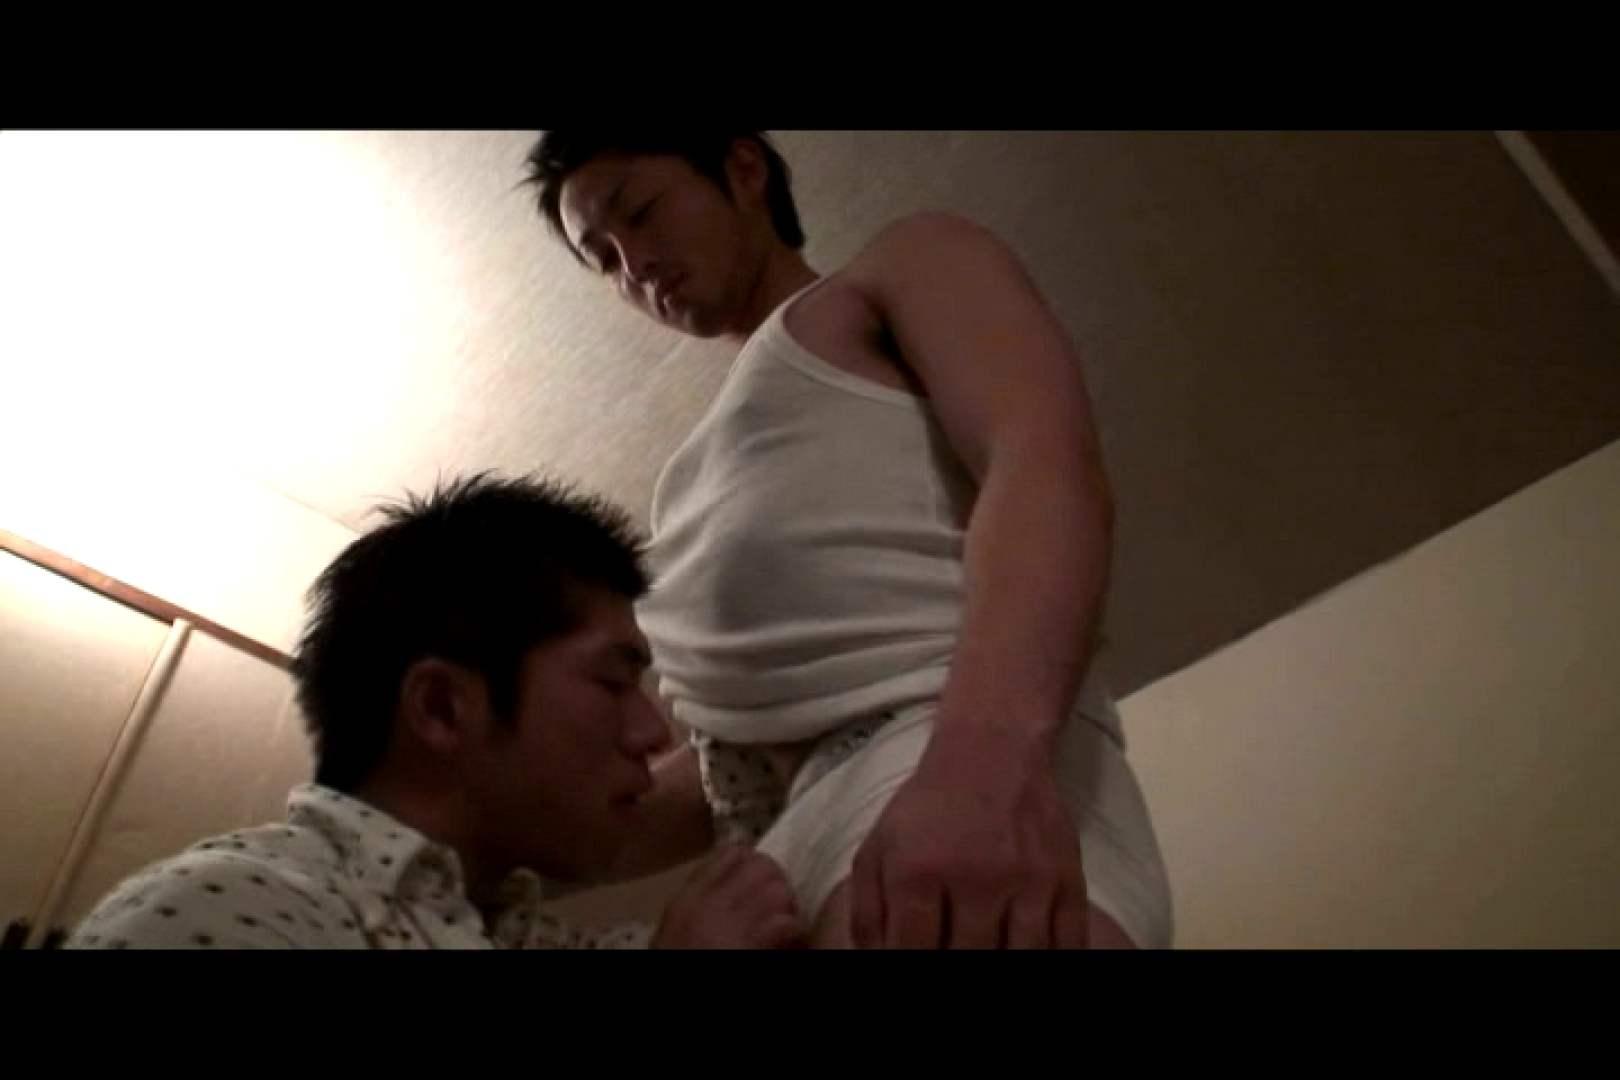 Bistro「イケメン」~Mokkori和風仕立て~vol.01 顔射DE行く ゲイエロビデオ画像 111pic 70